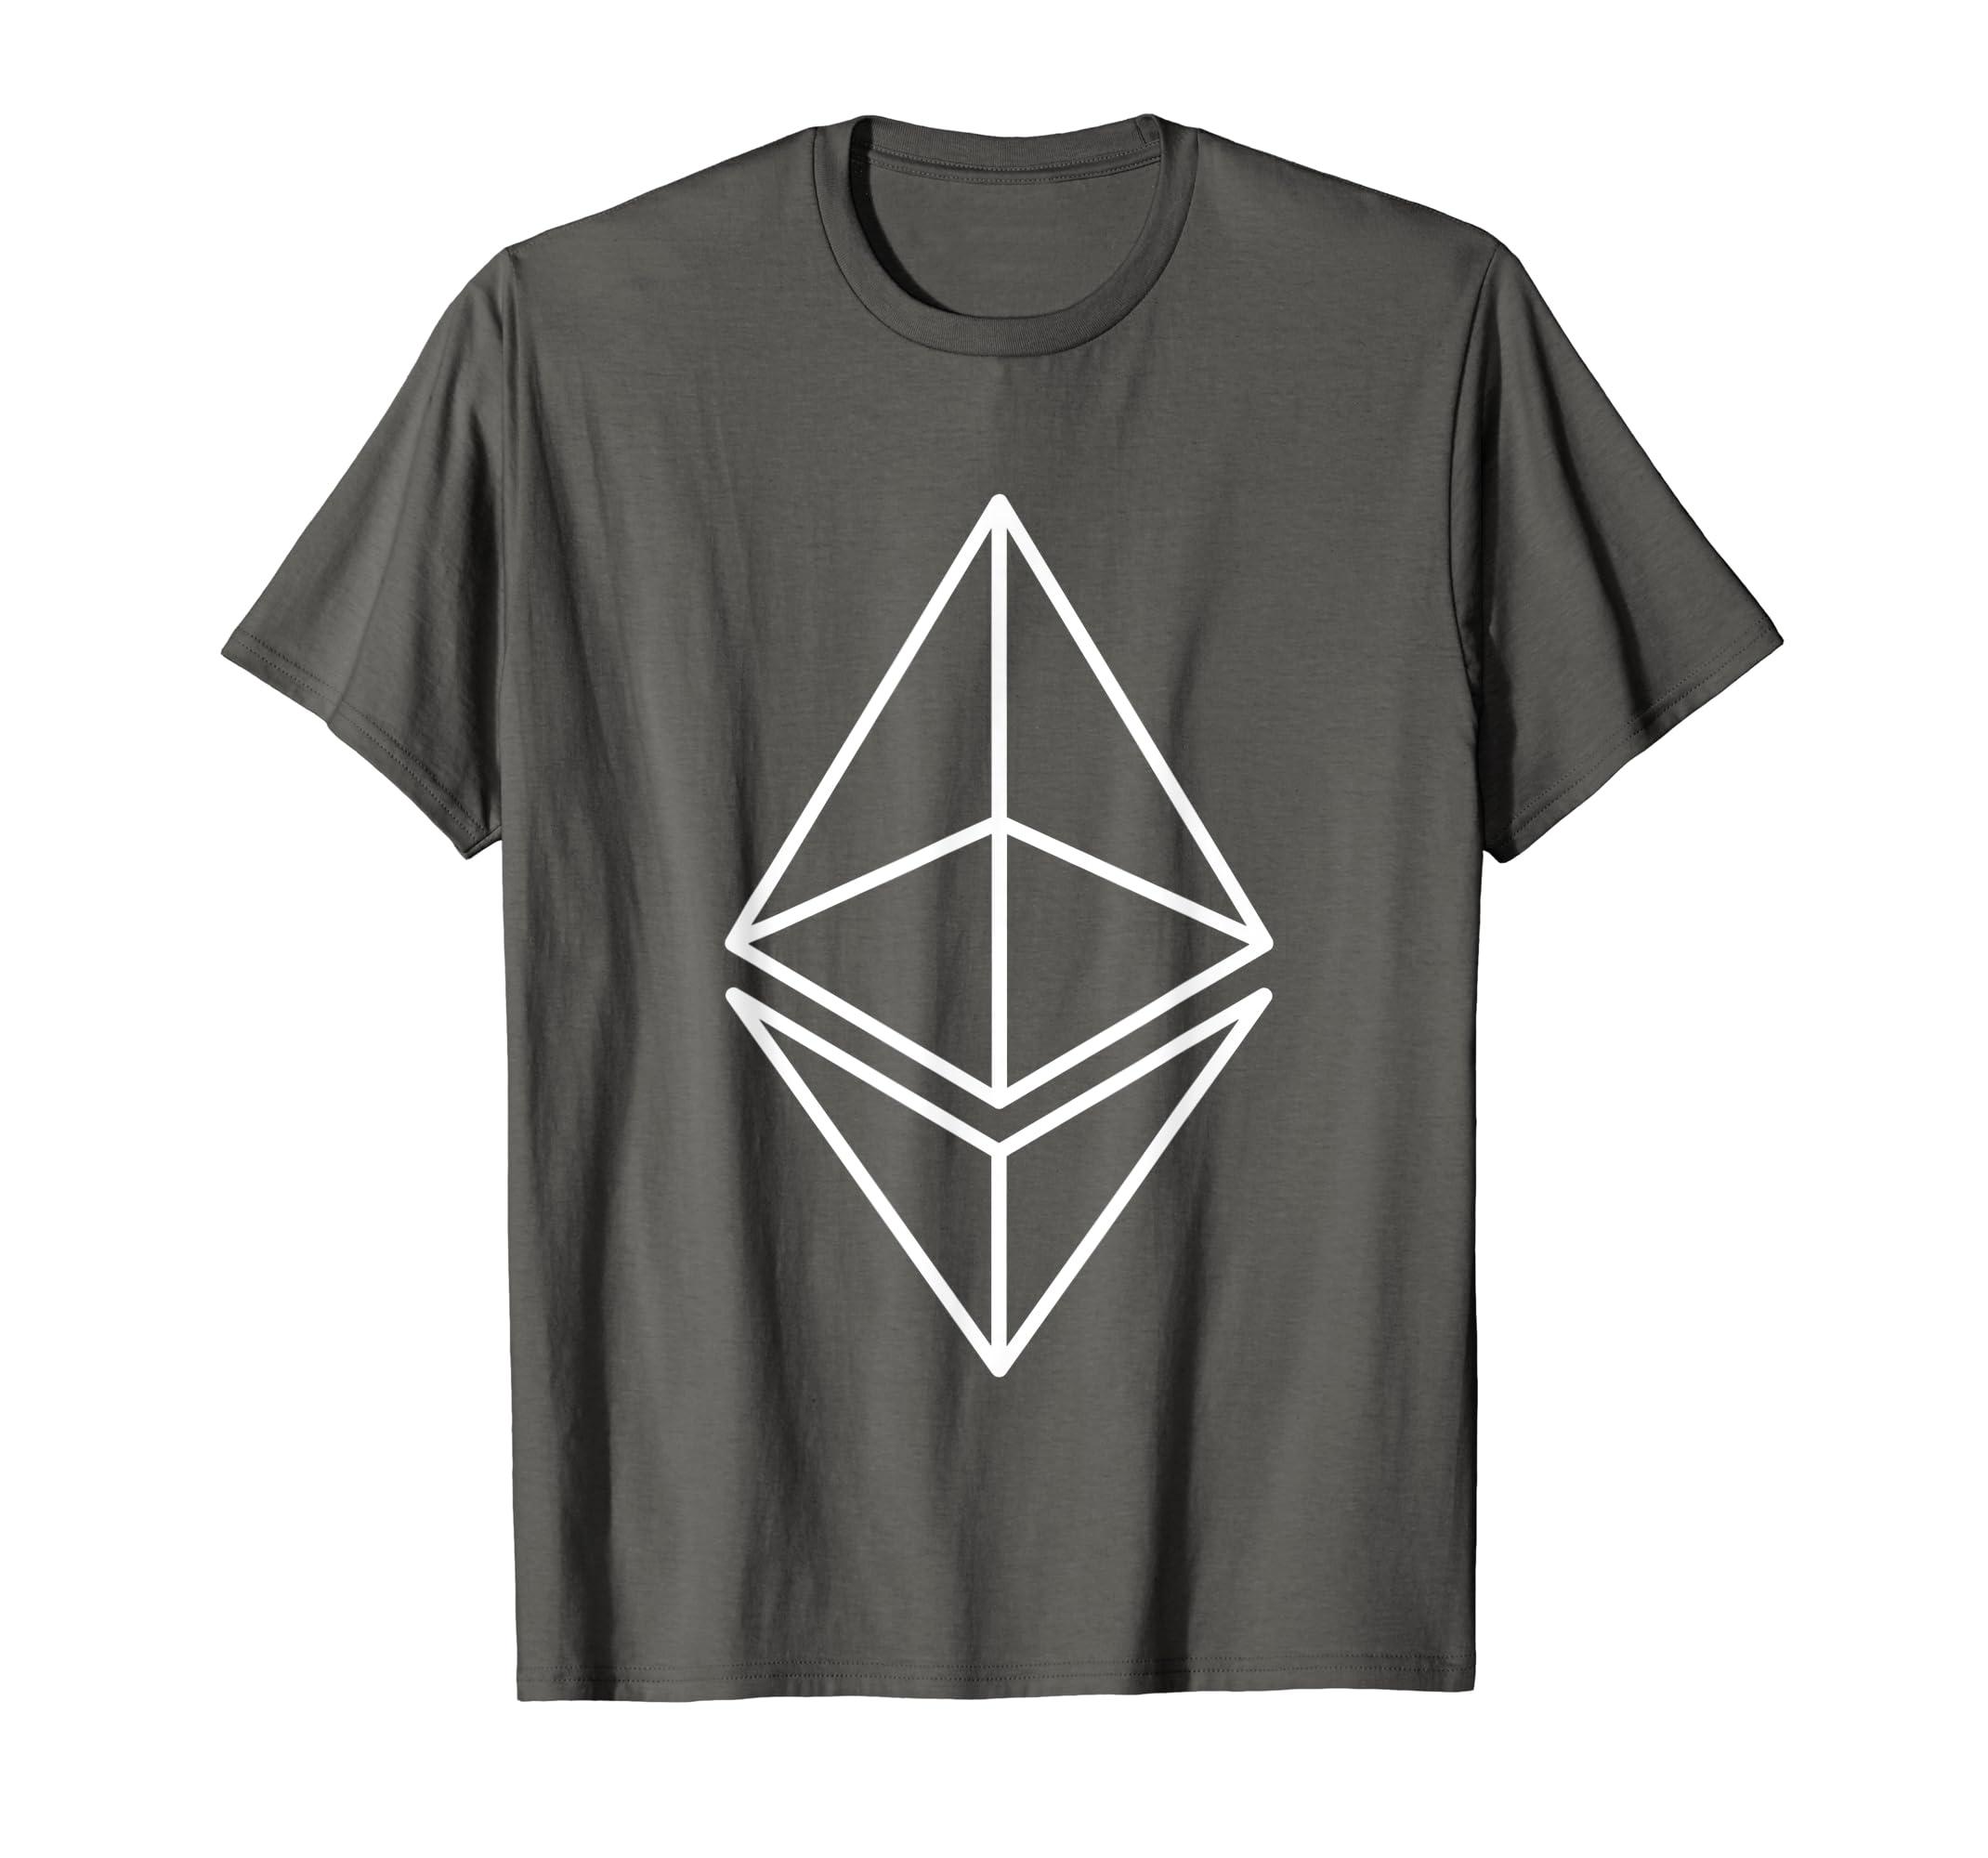 507bd8877e0 Amazon.com  Ethereum T-Shirt  Clothing